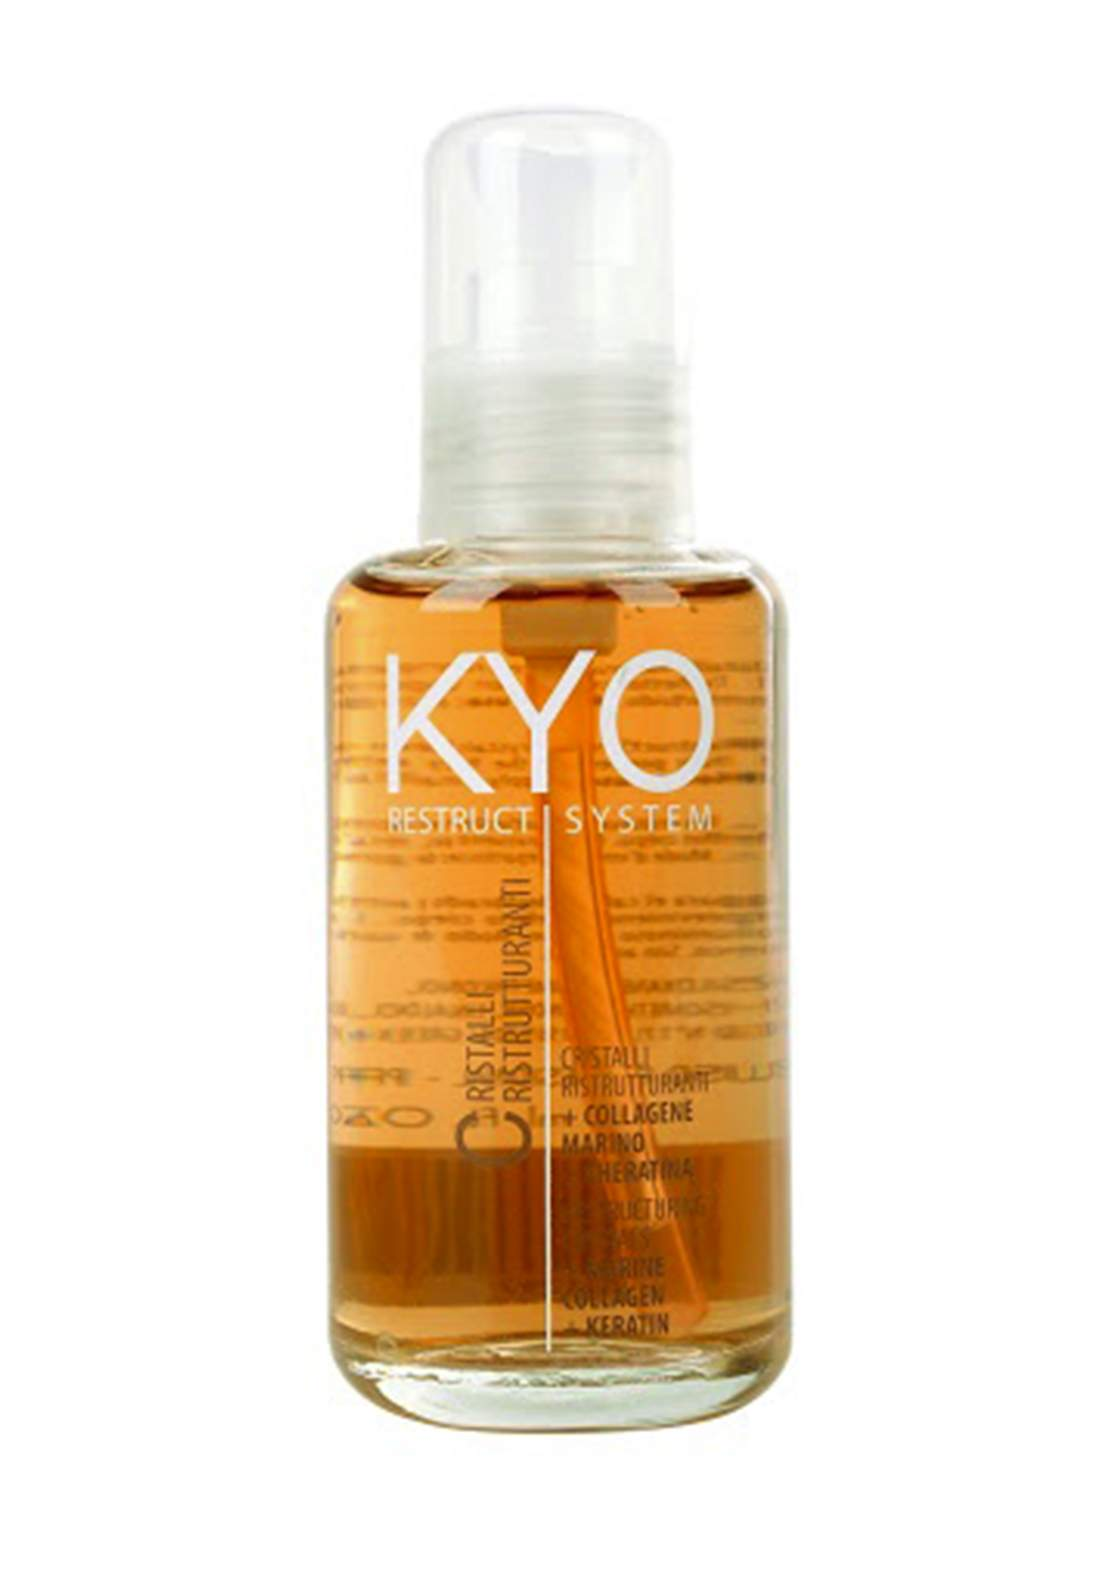 Kyo Restruct System 100 ml - Yellow  سيروم كولاجين وكيراتين للشعر